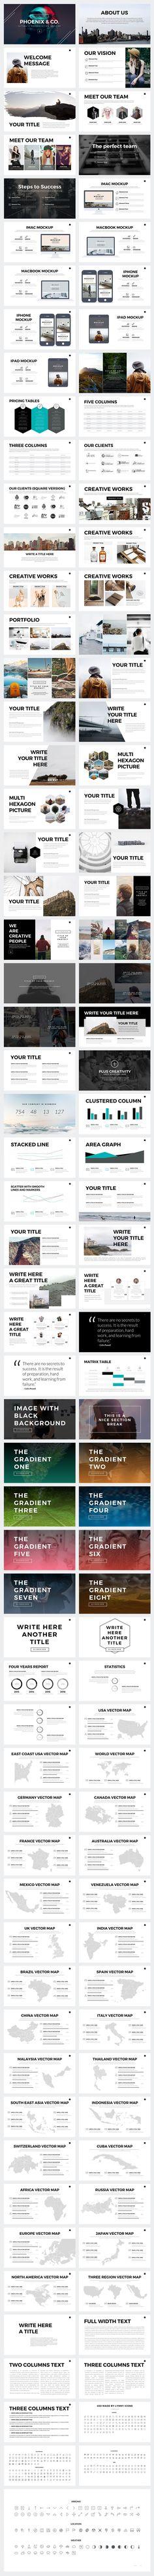 Phoenix Minimal Keynote Template by Slidedizer on @creativemarket